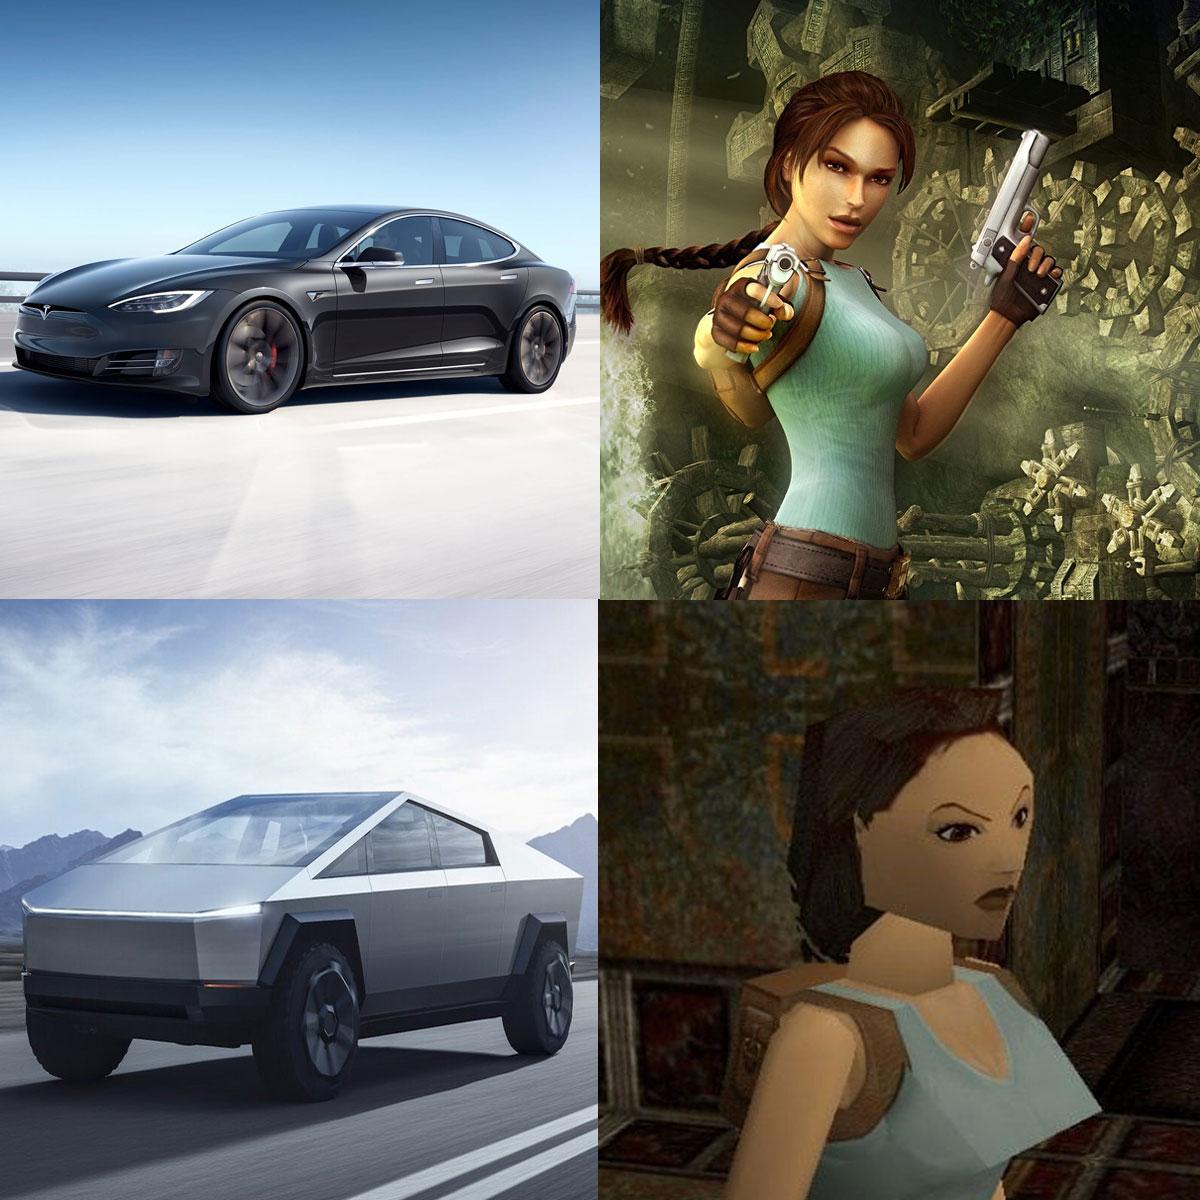 Cybertruck Tesla Meme - Tomb Raider